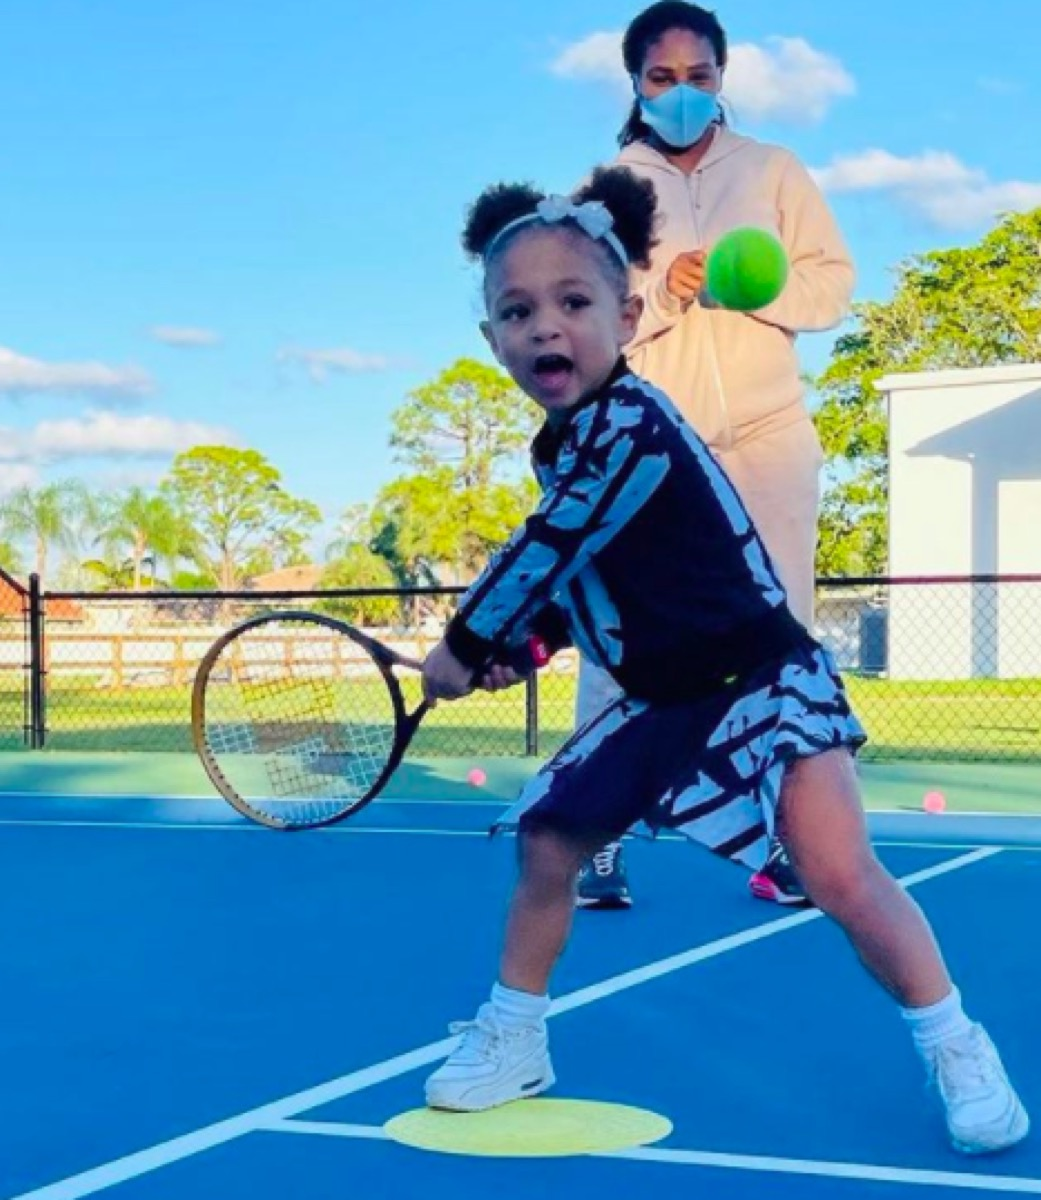 Serena Williams' daughter Alexis